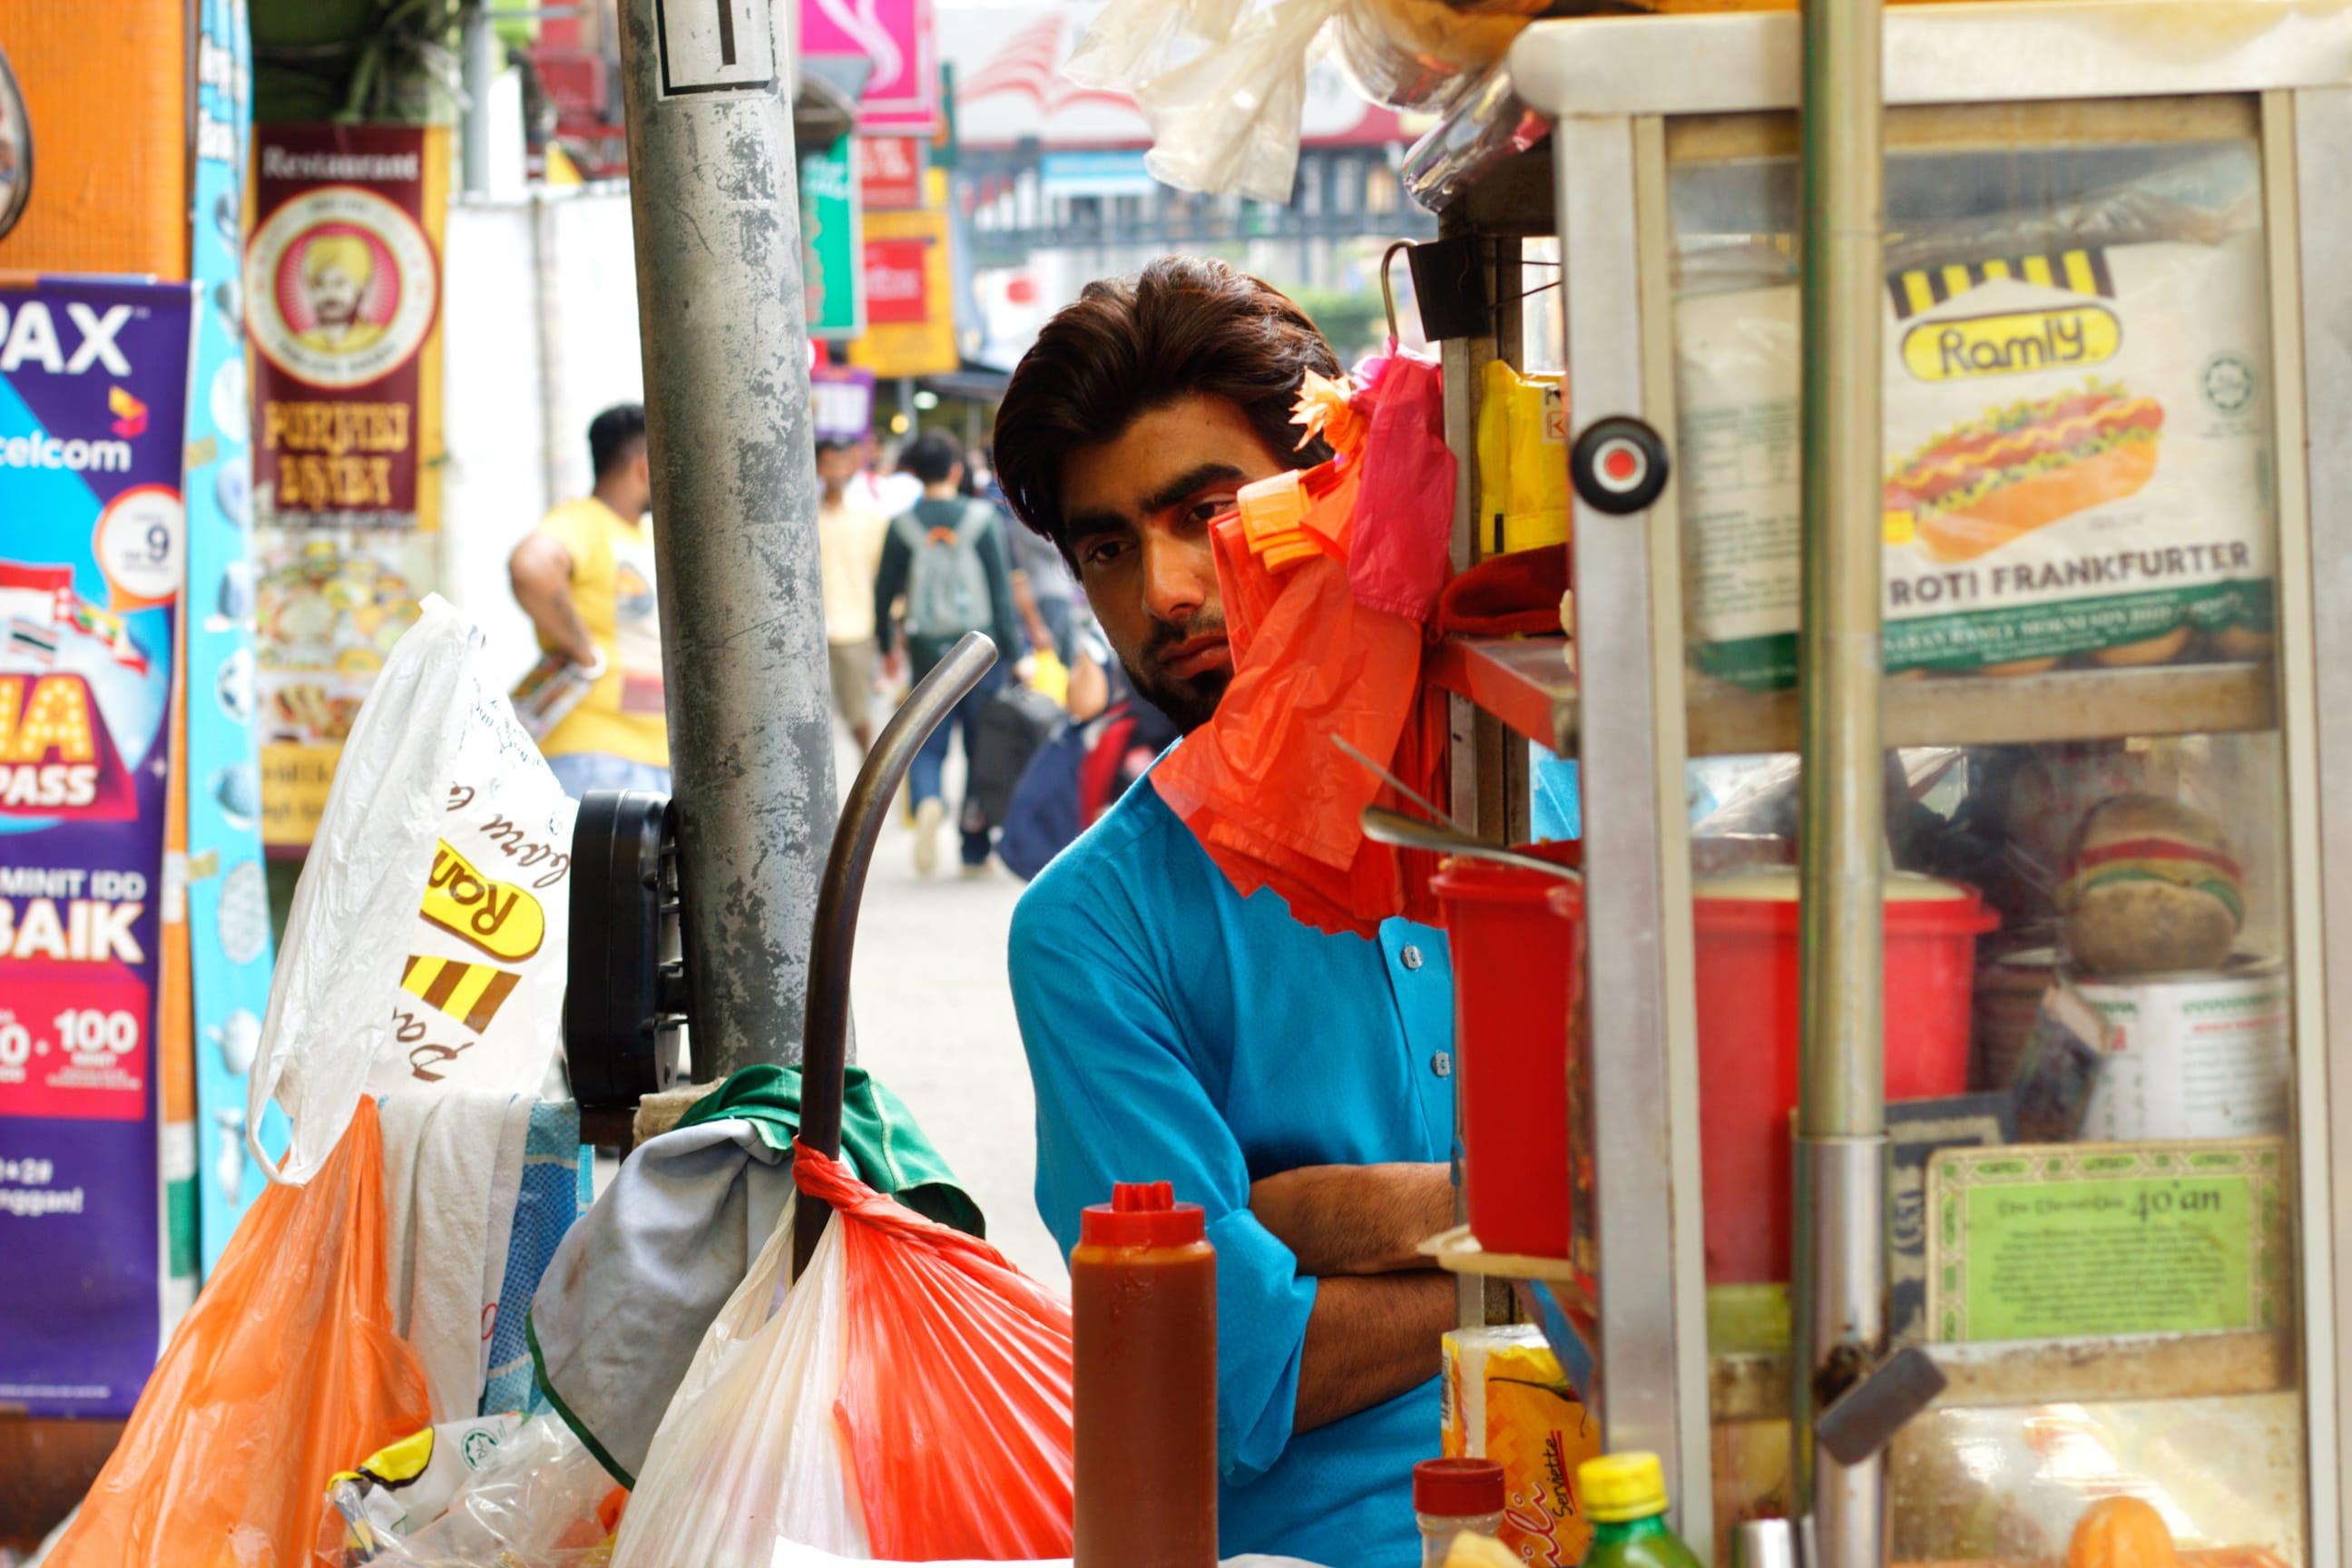 A Man at a Street Food Stall in Kuala Lumpur